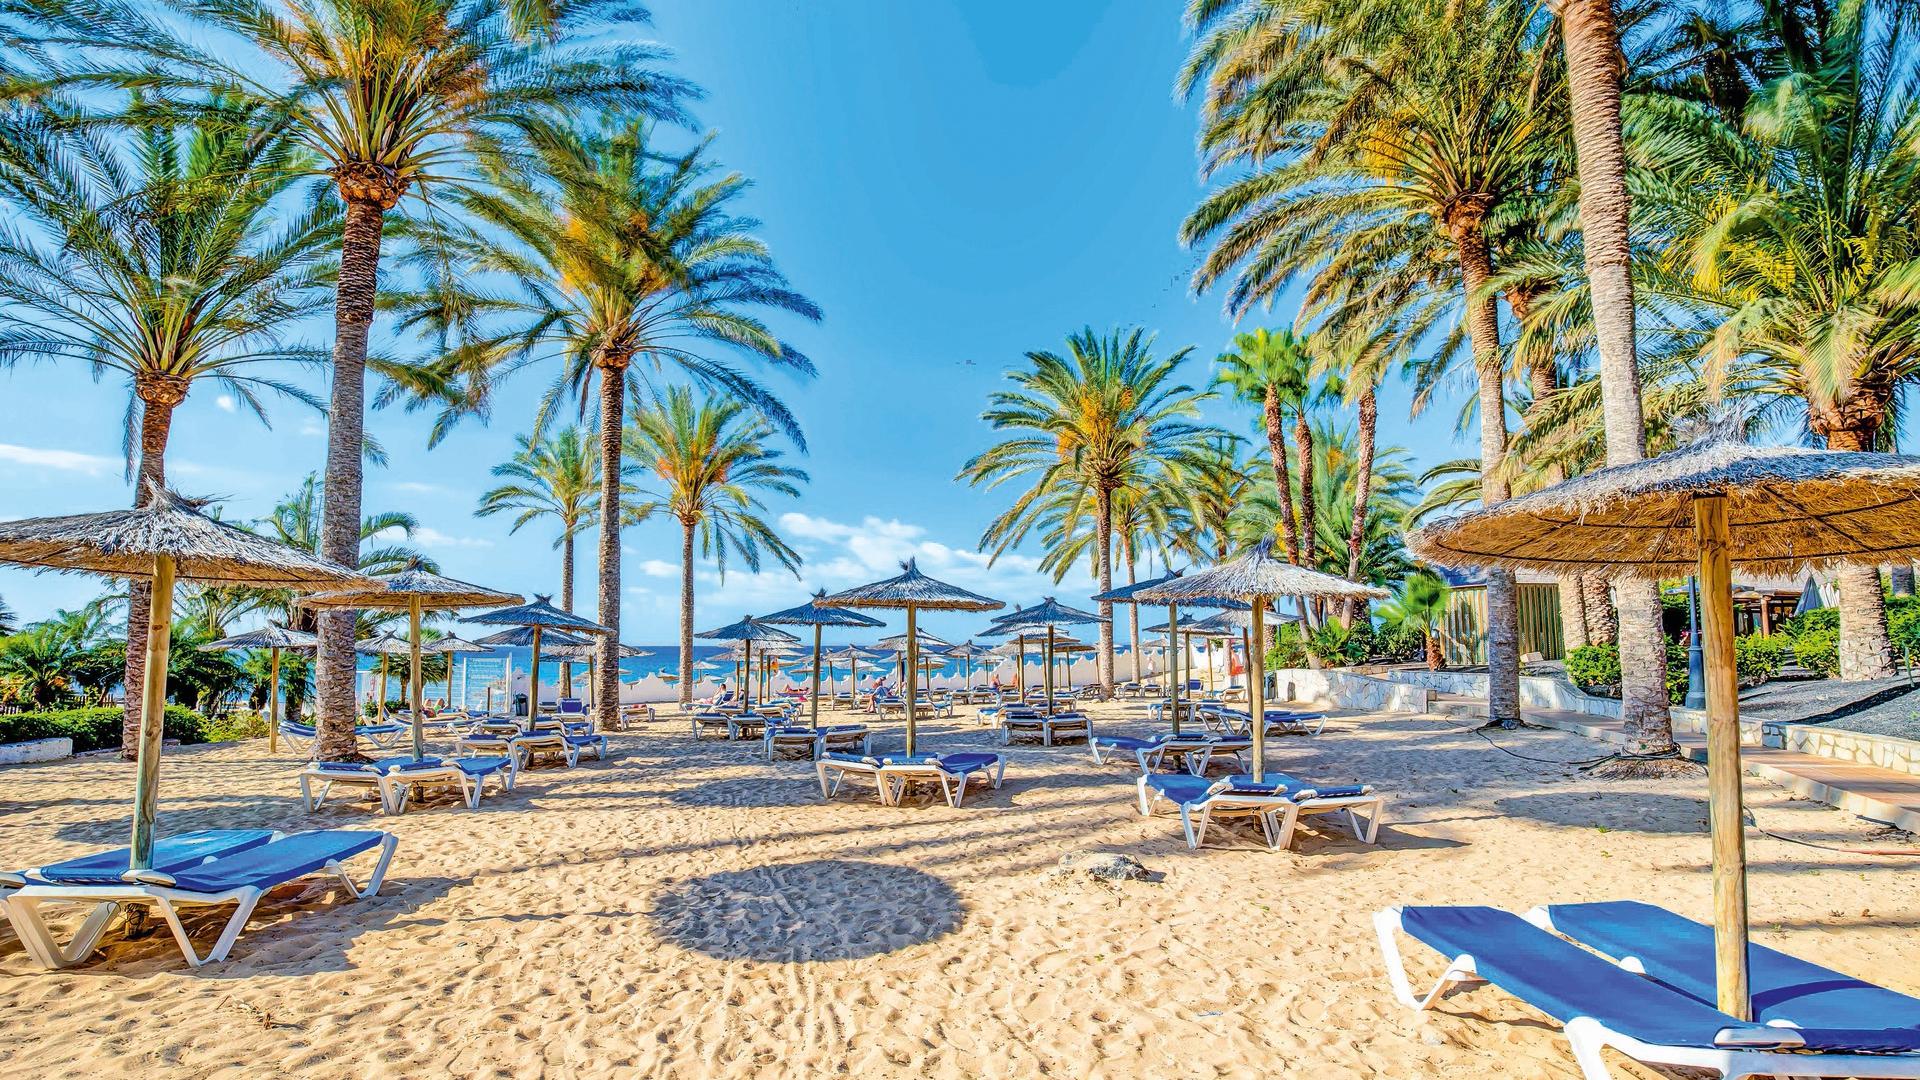 Costa Calma Beach Fuerteventura Pictures to pin on Pinterest